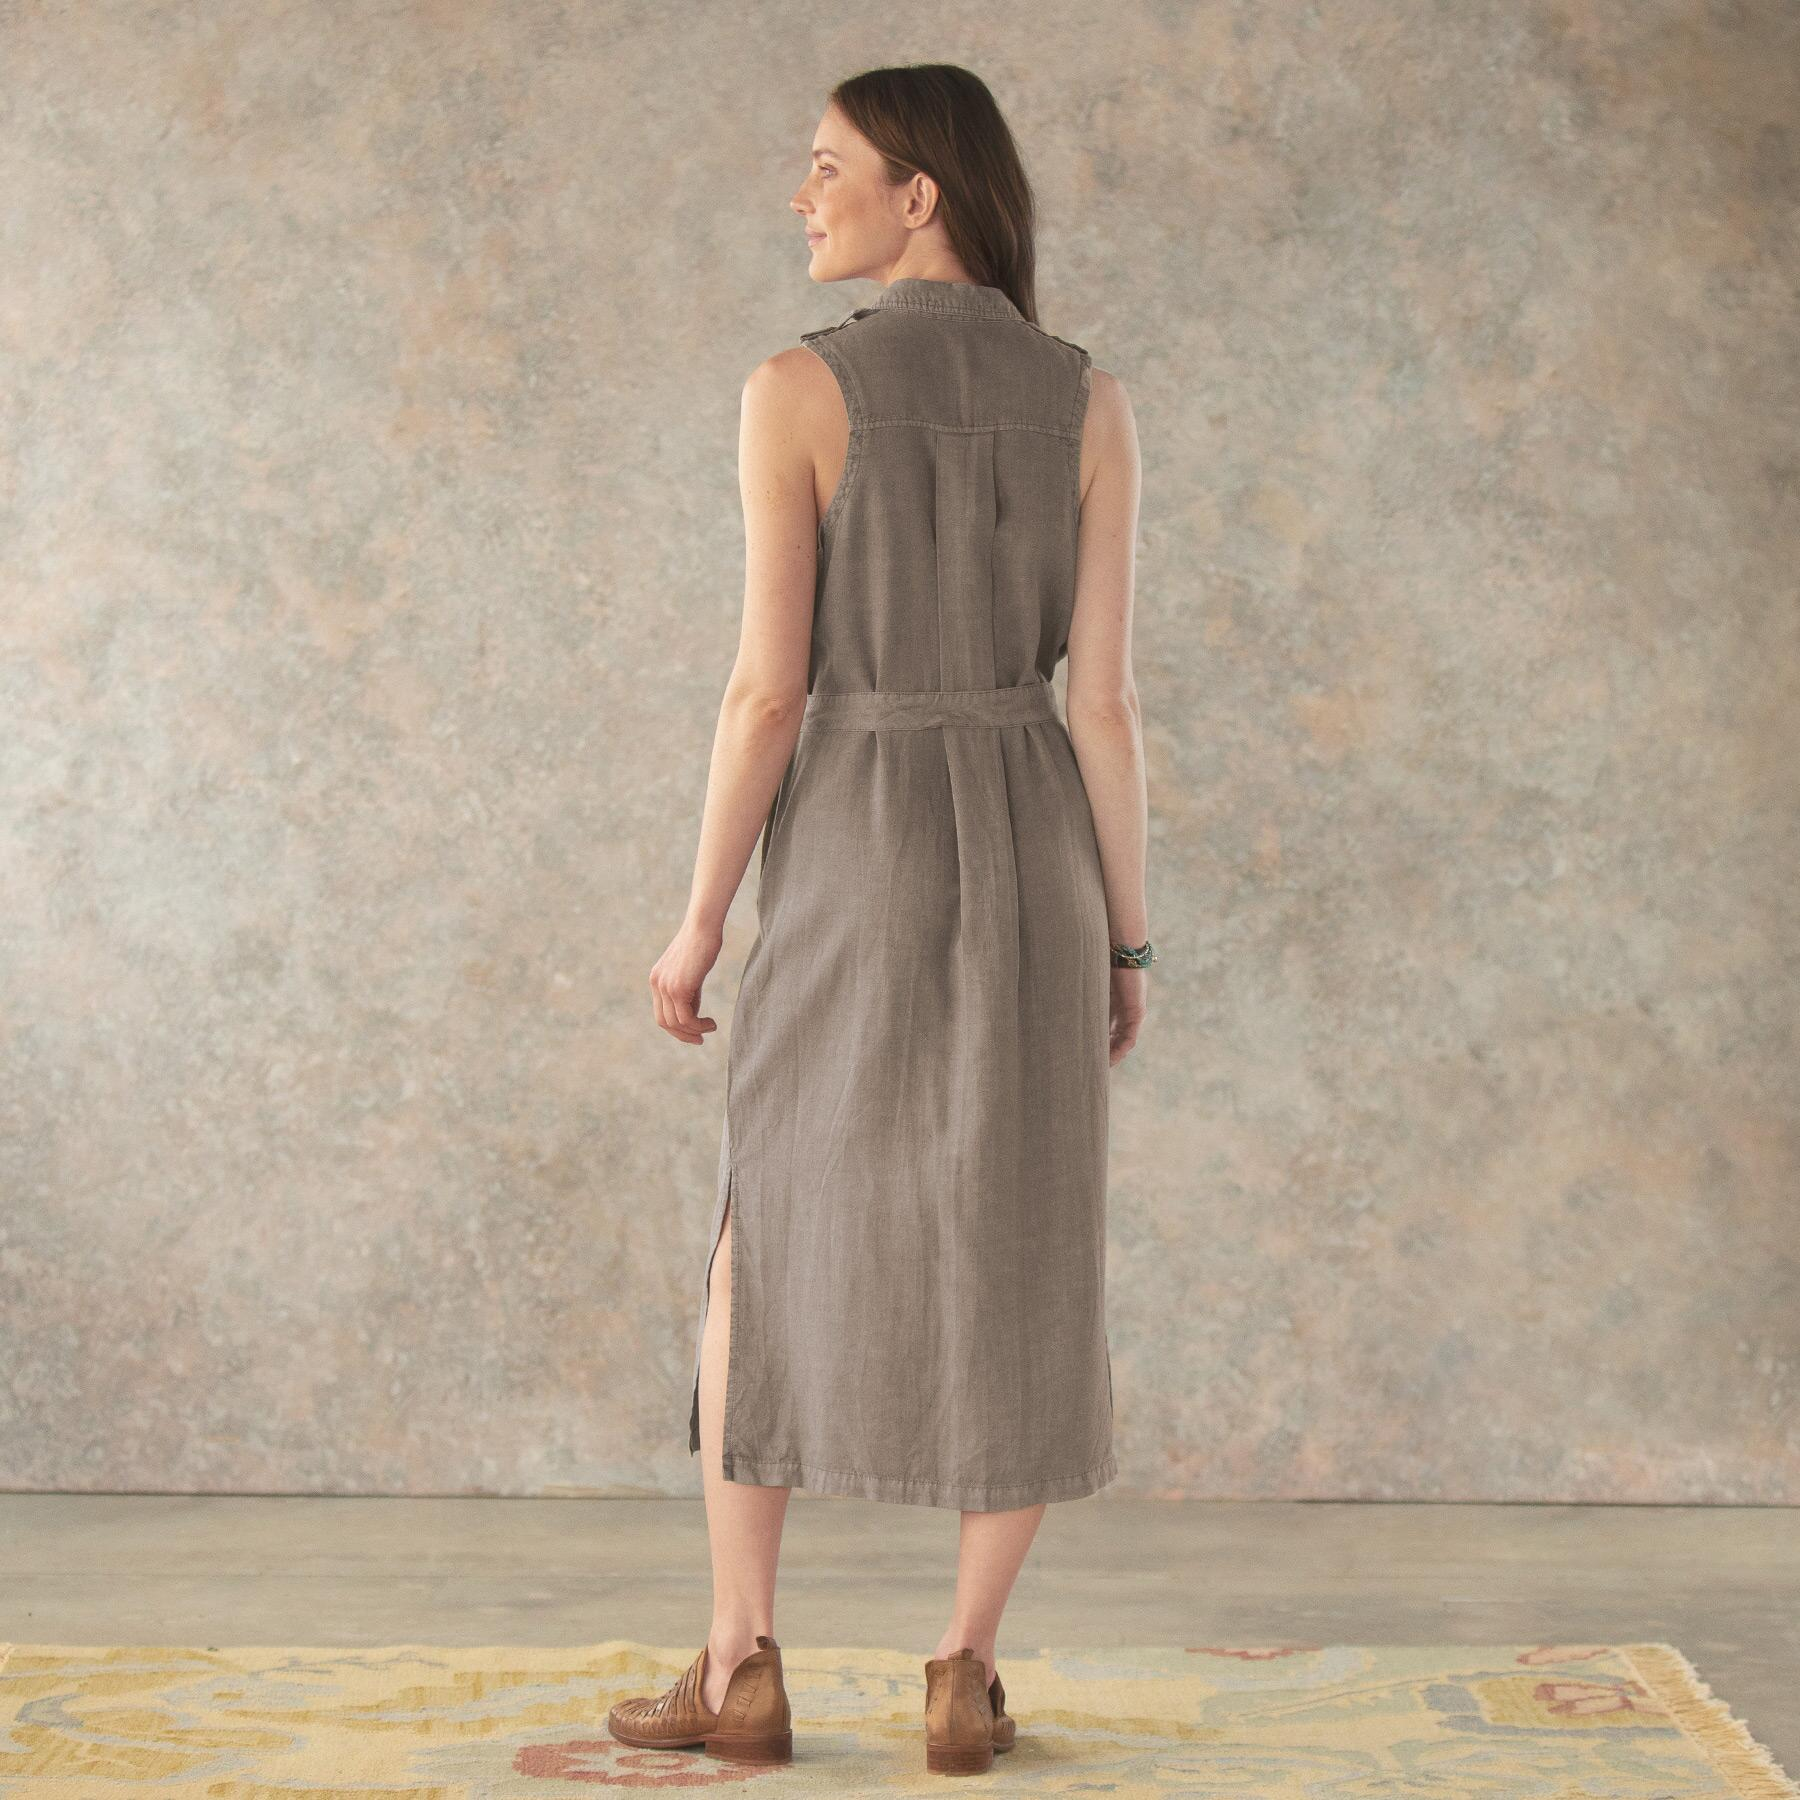 WESTWARD DRESS - PETITES: View 3